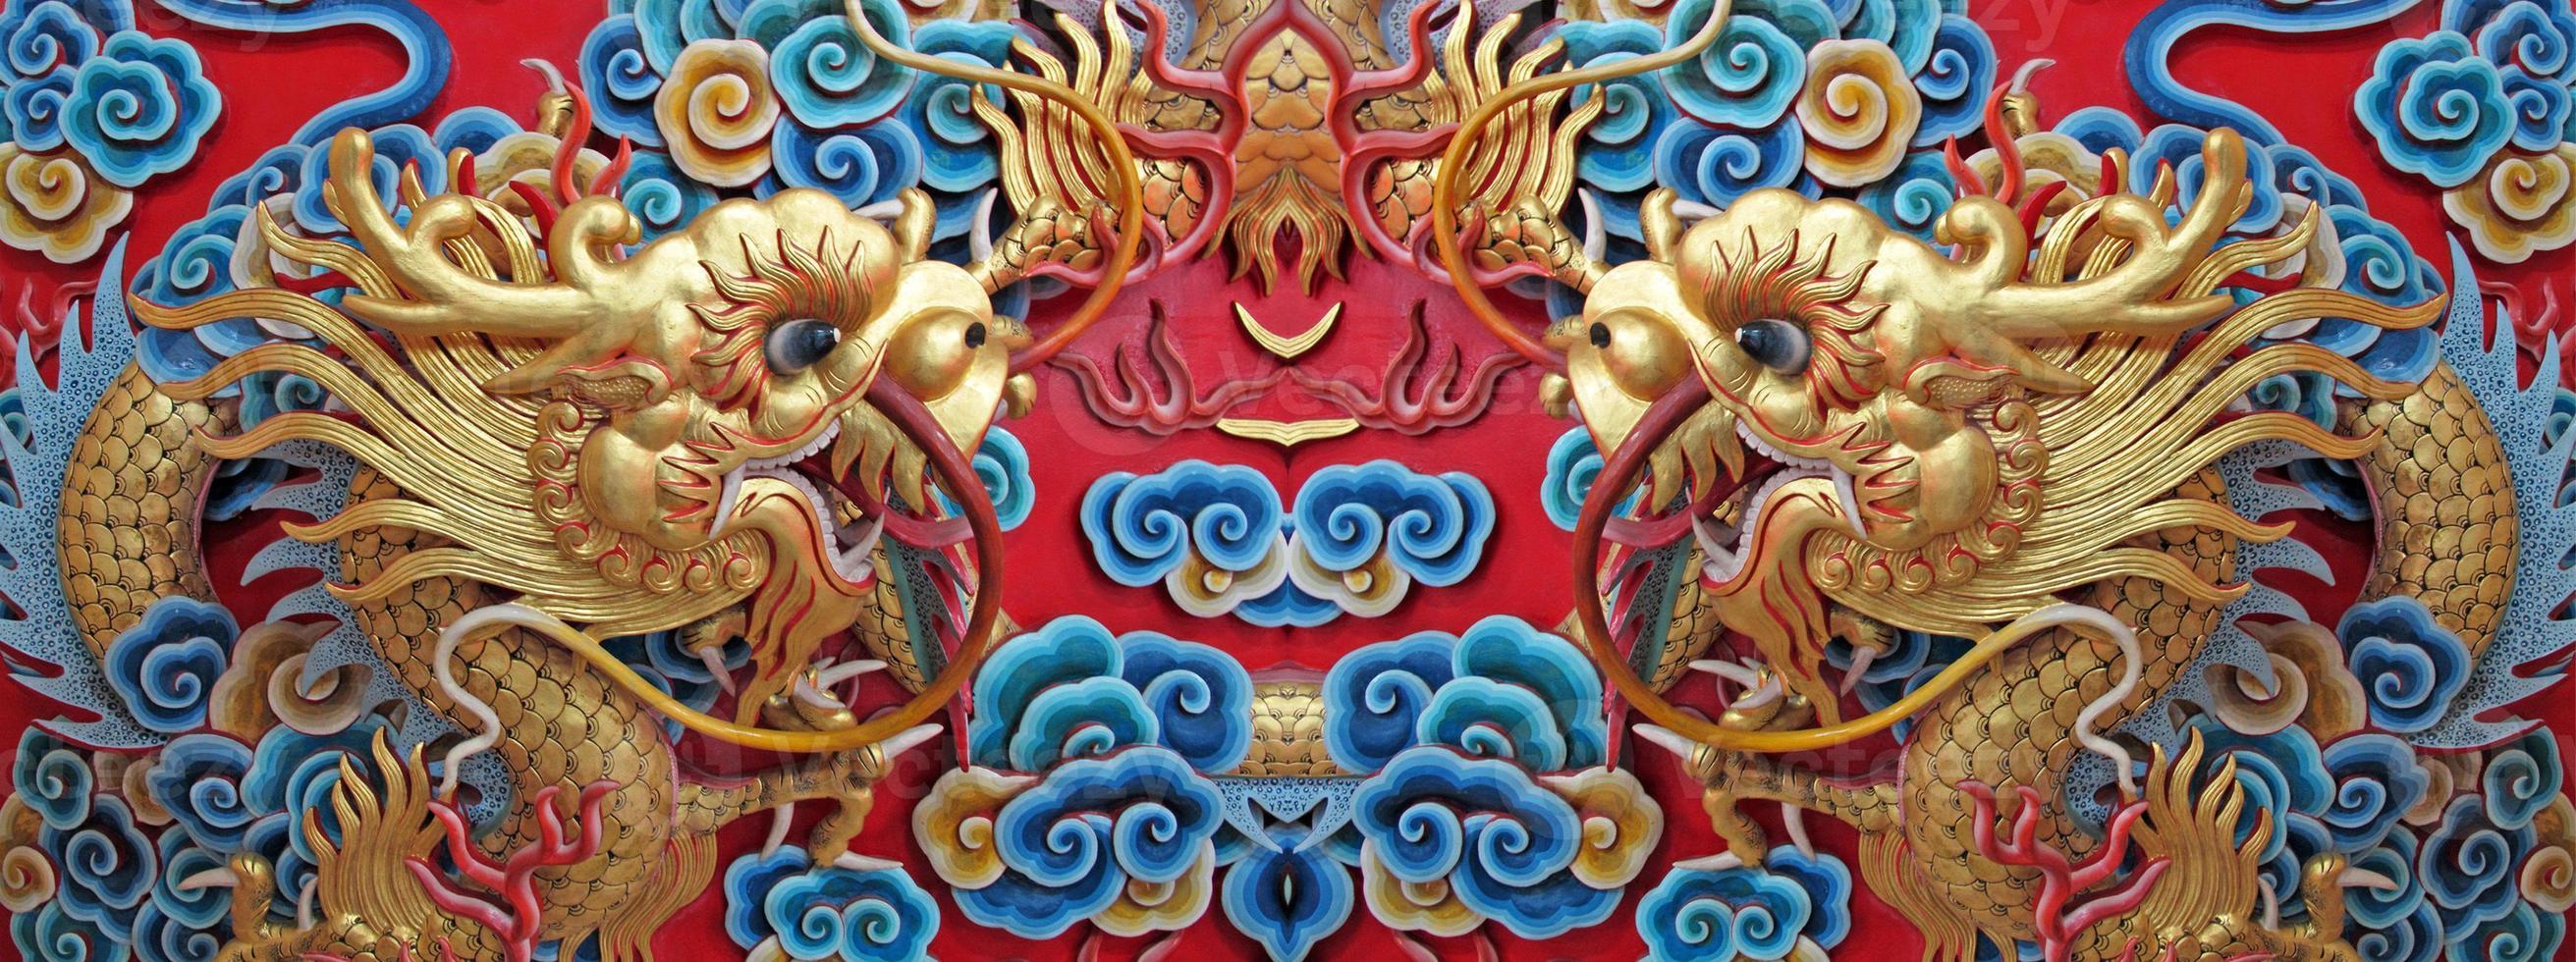 dragão gêmeo foto